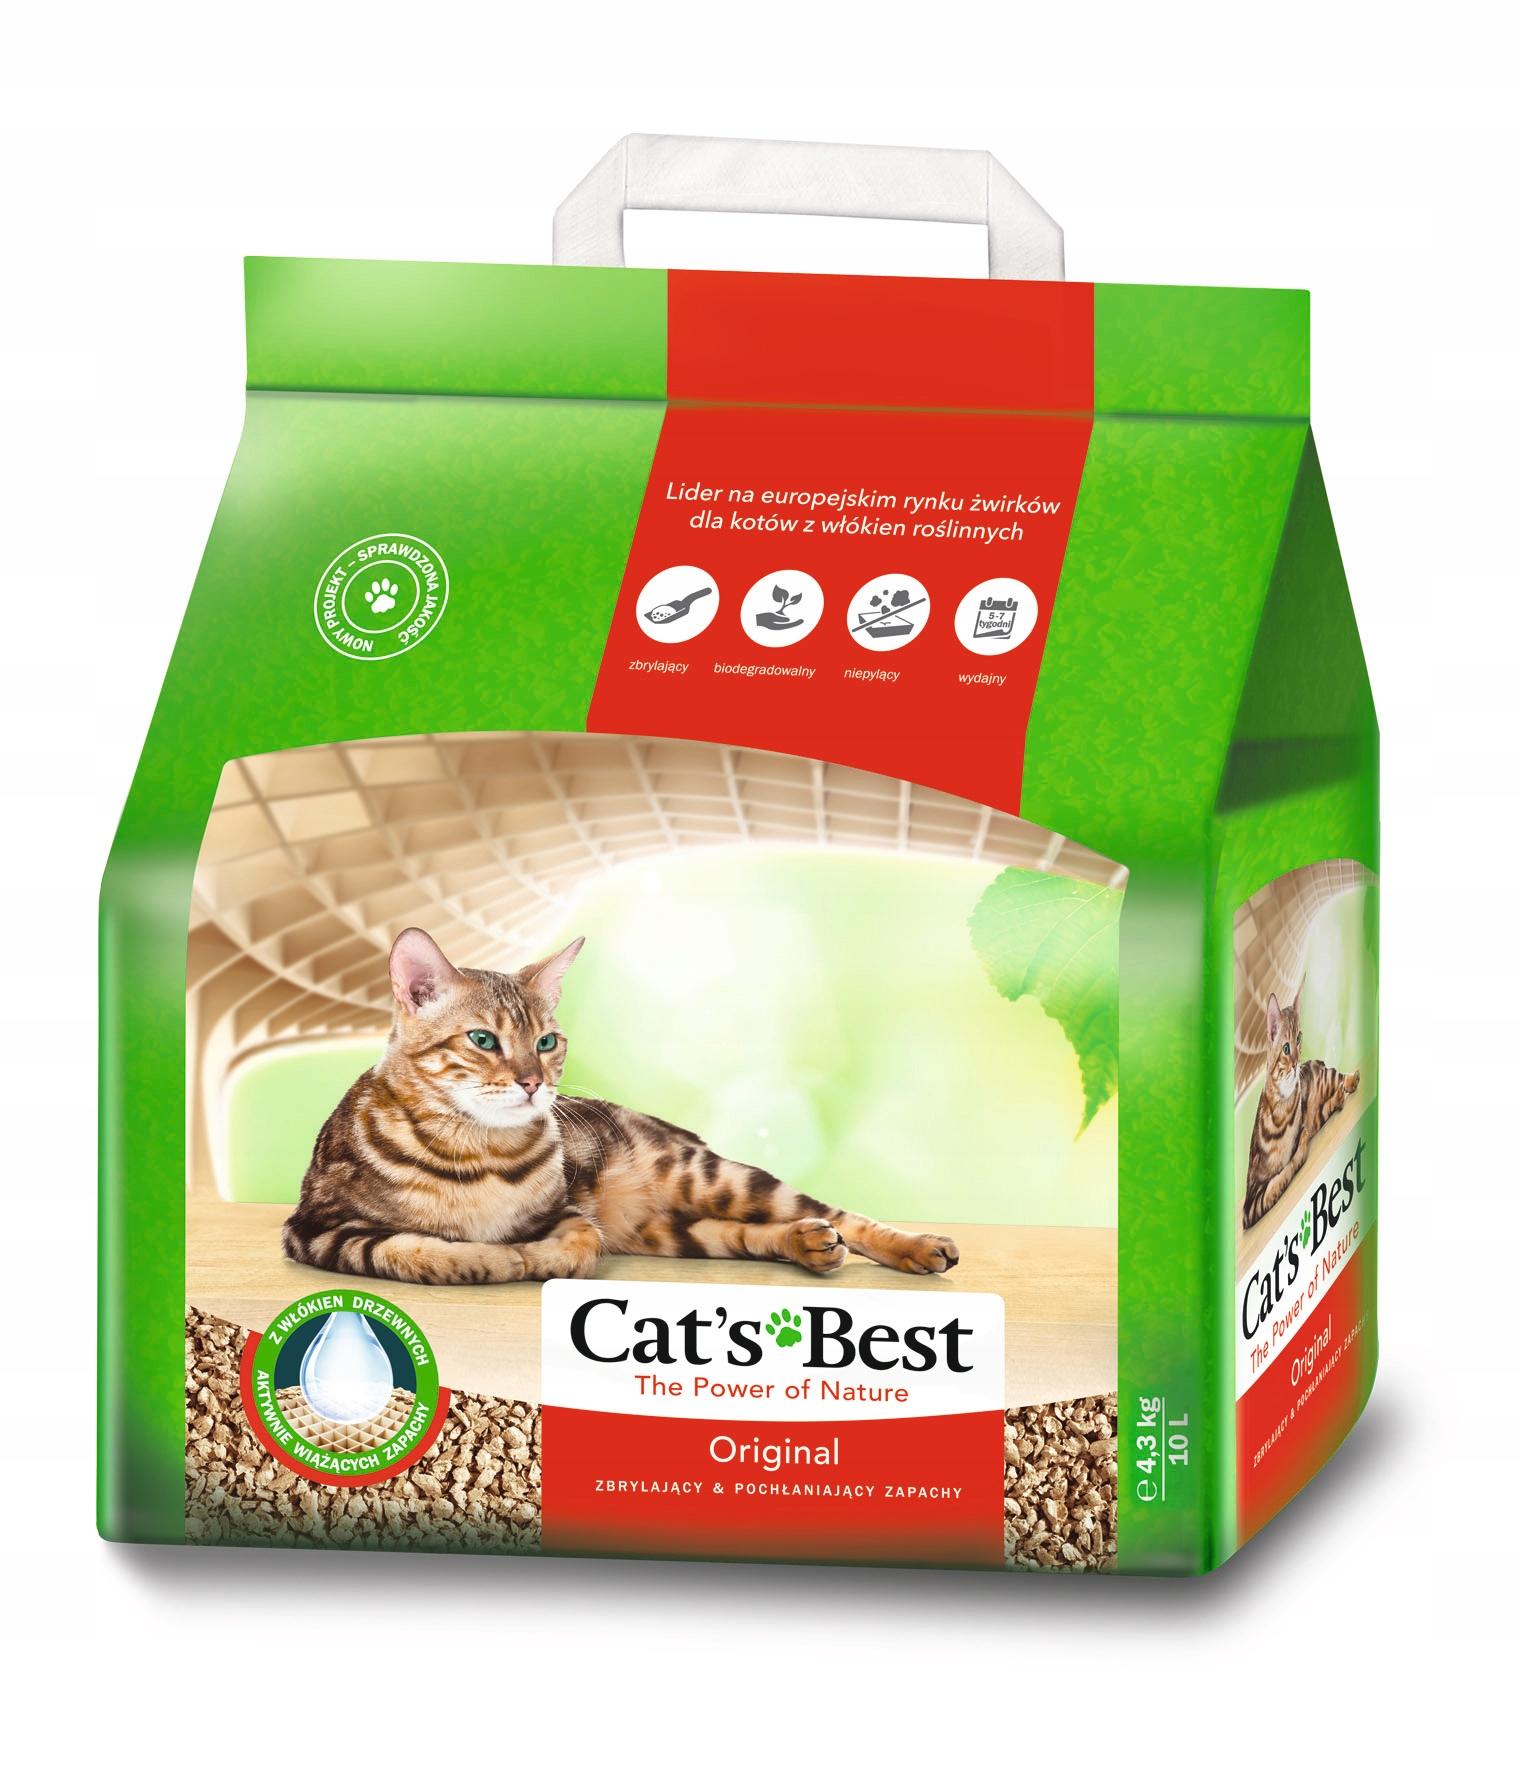 Zwirek Cats Best Cat X27 S Best 20l Wiadro Promocja 6745565986 Allegro Pl